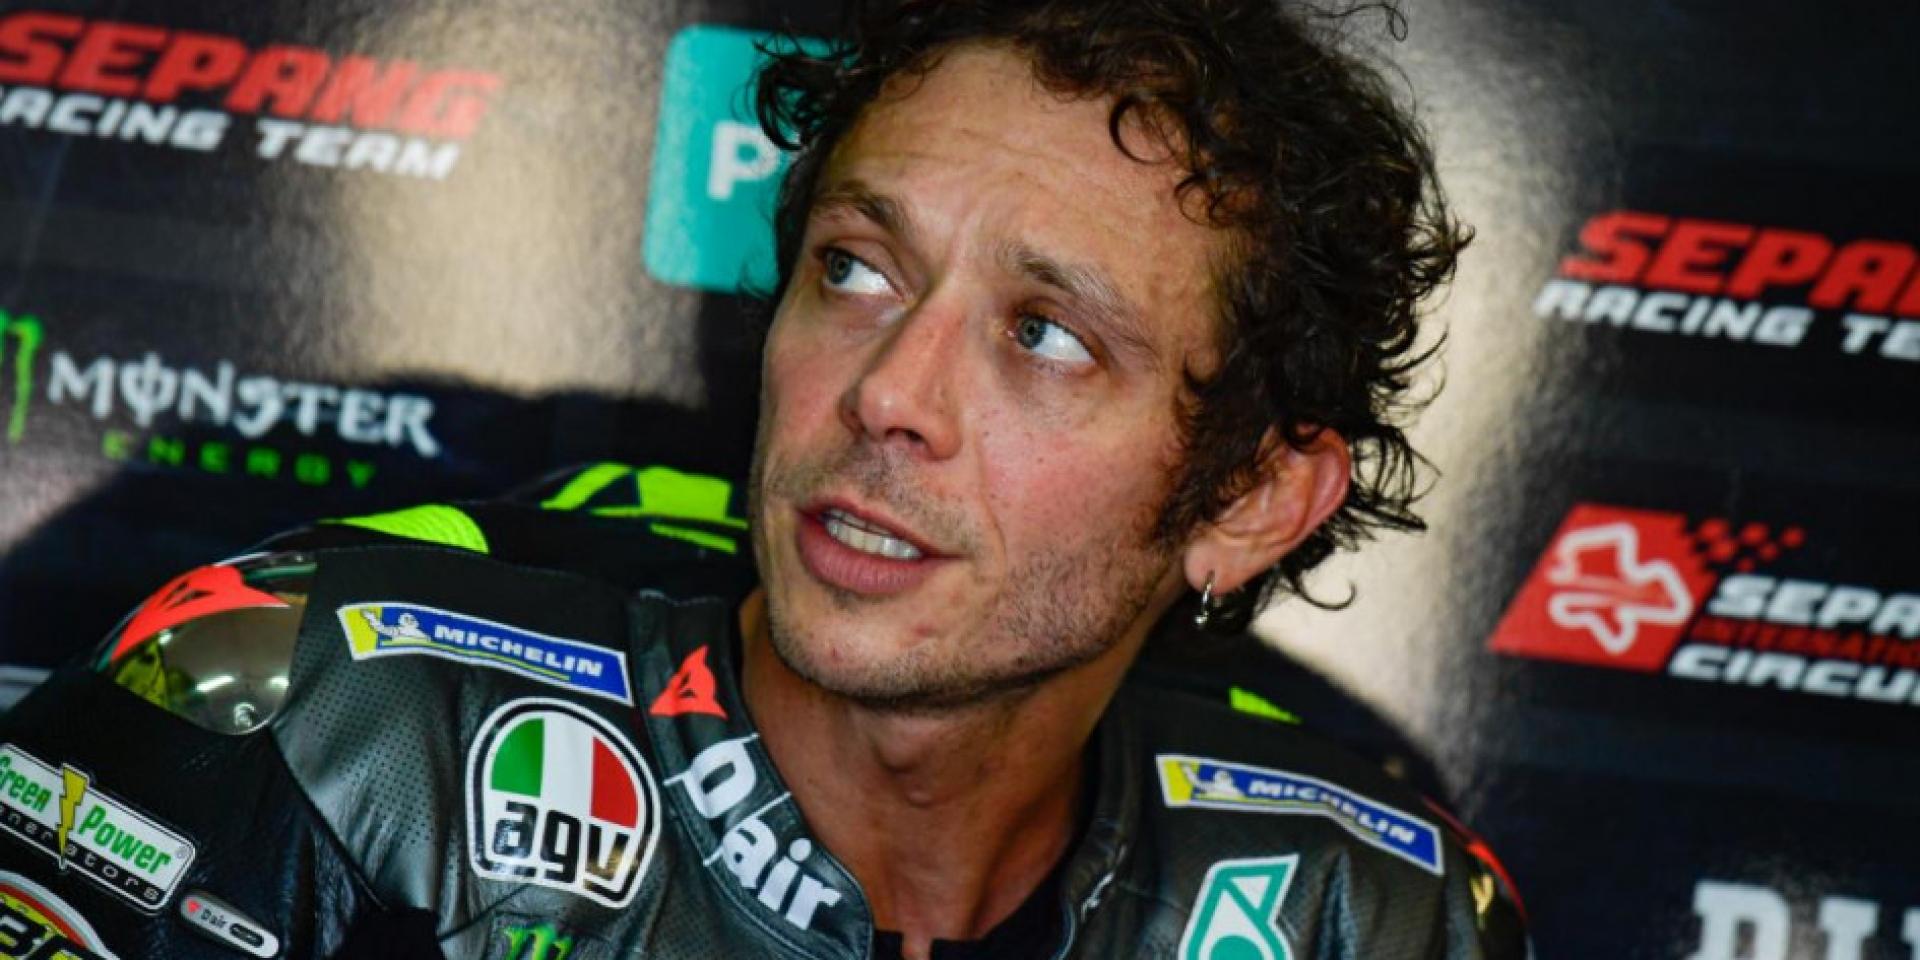 VR46車隊能否進軍MotoGP級別?Rossi很有信心 但贊助商卻表示還沒決定!